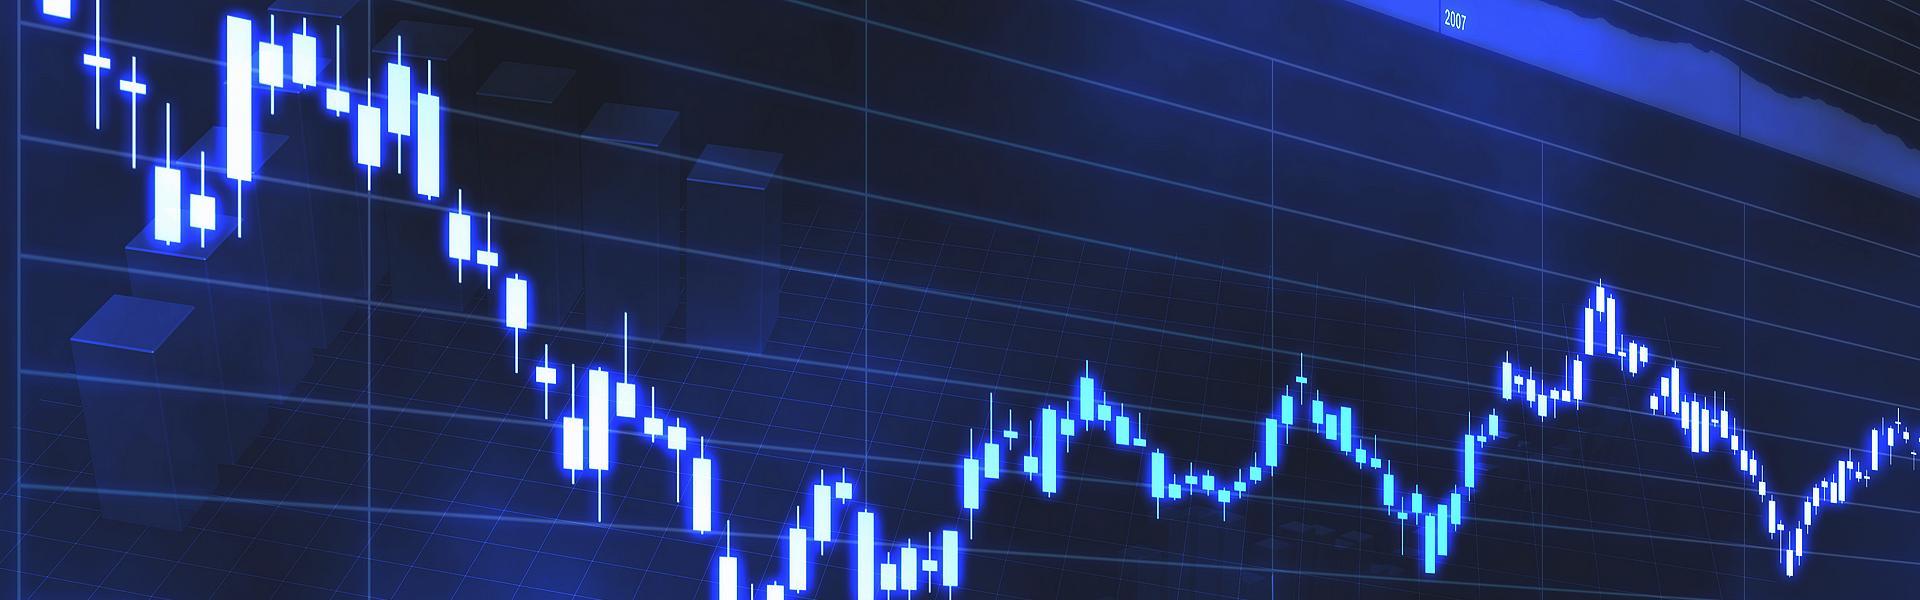 Koło Naukowe Finanse i Gospodarka